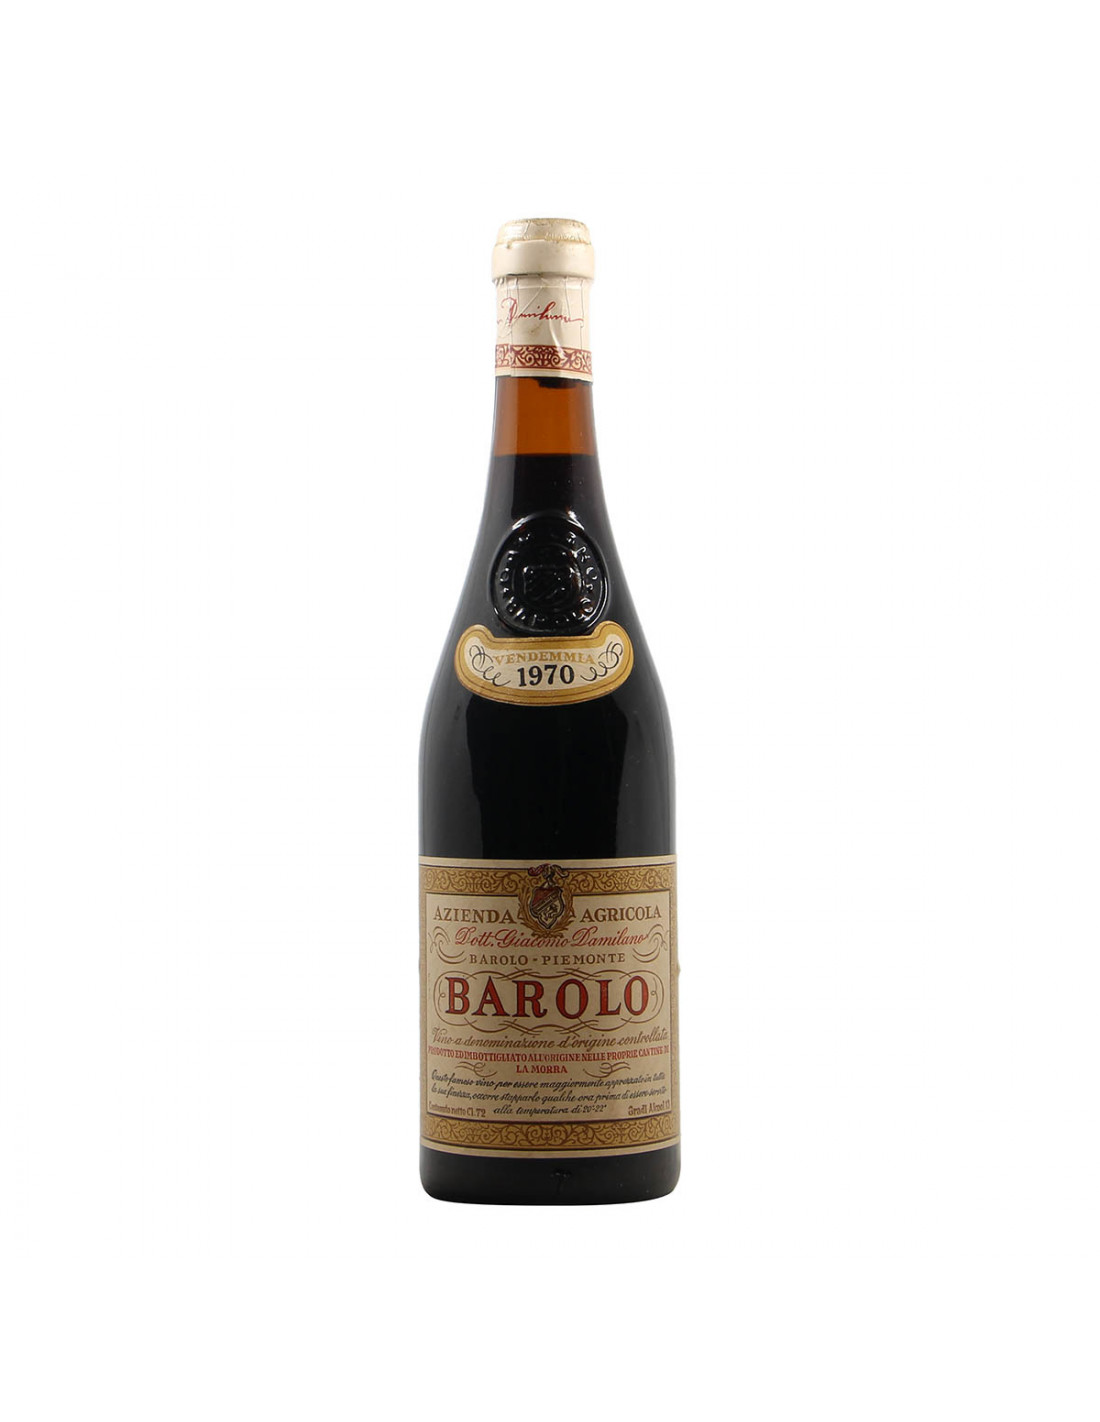 Damilano Barolo 1970